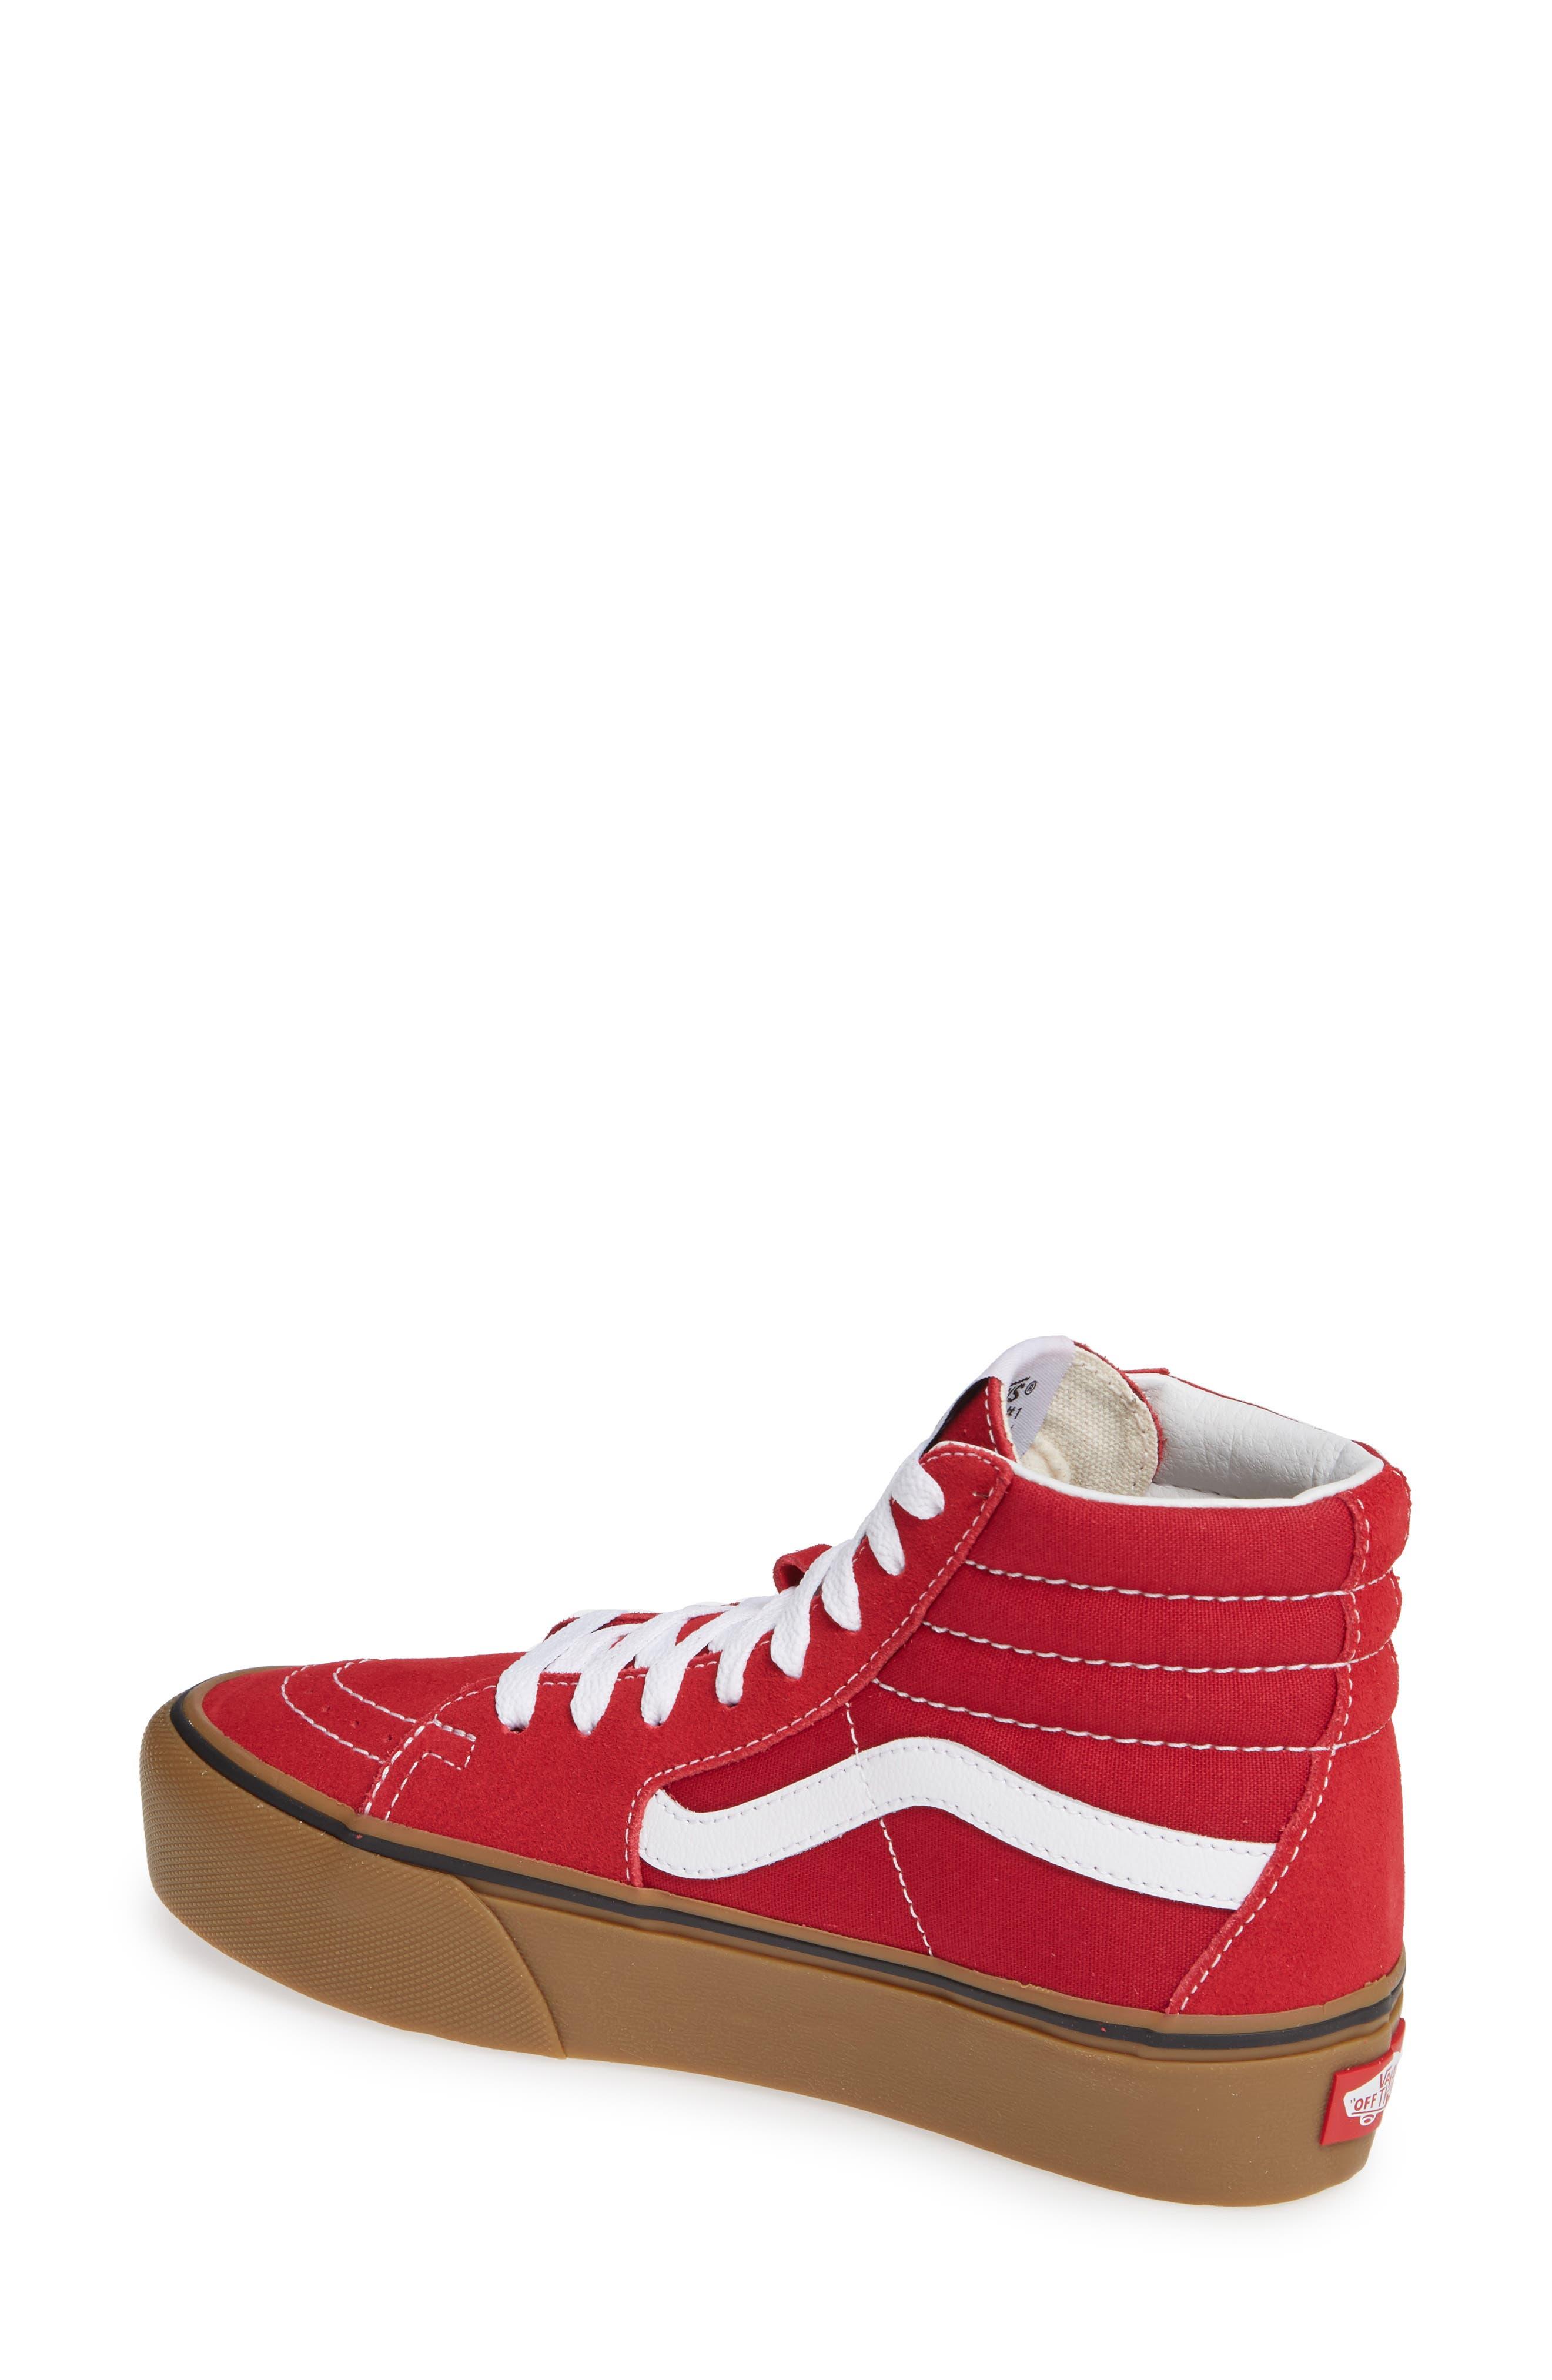 Sk8-Hi Platform Sneaker,                             Alternate thumbnail 2, color,                             SCOOTER/ TRUE WHITE